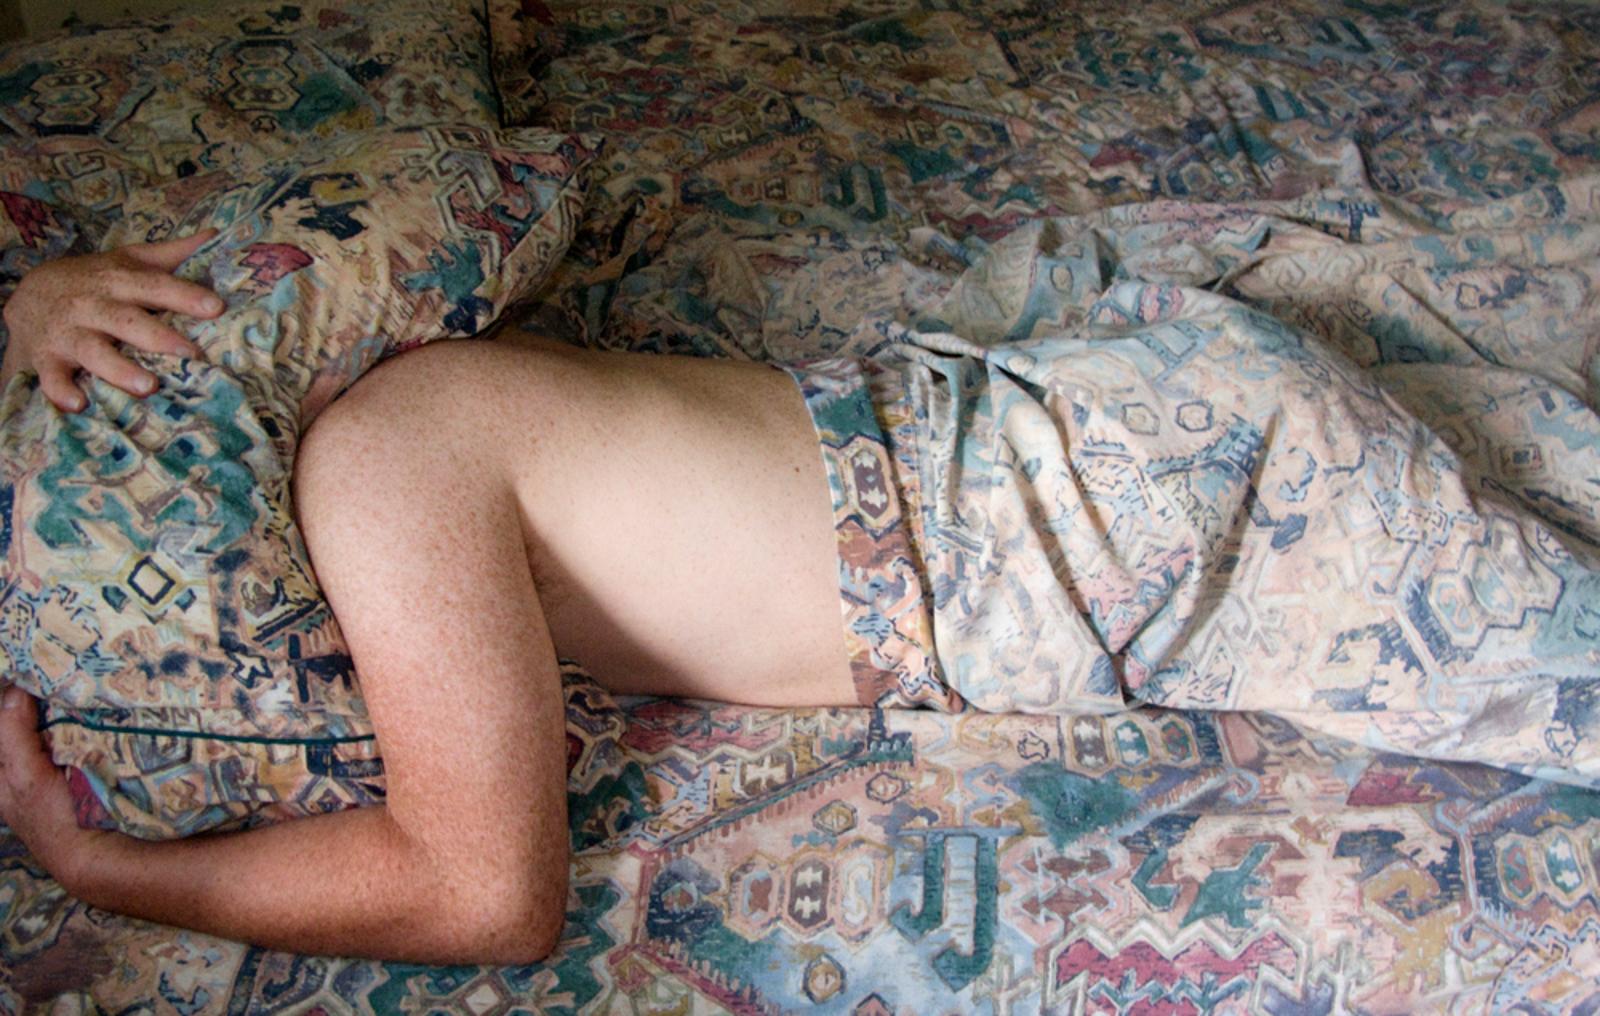 man hiding under sheets